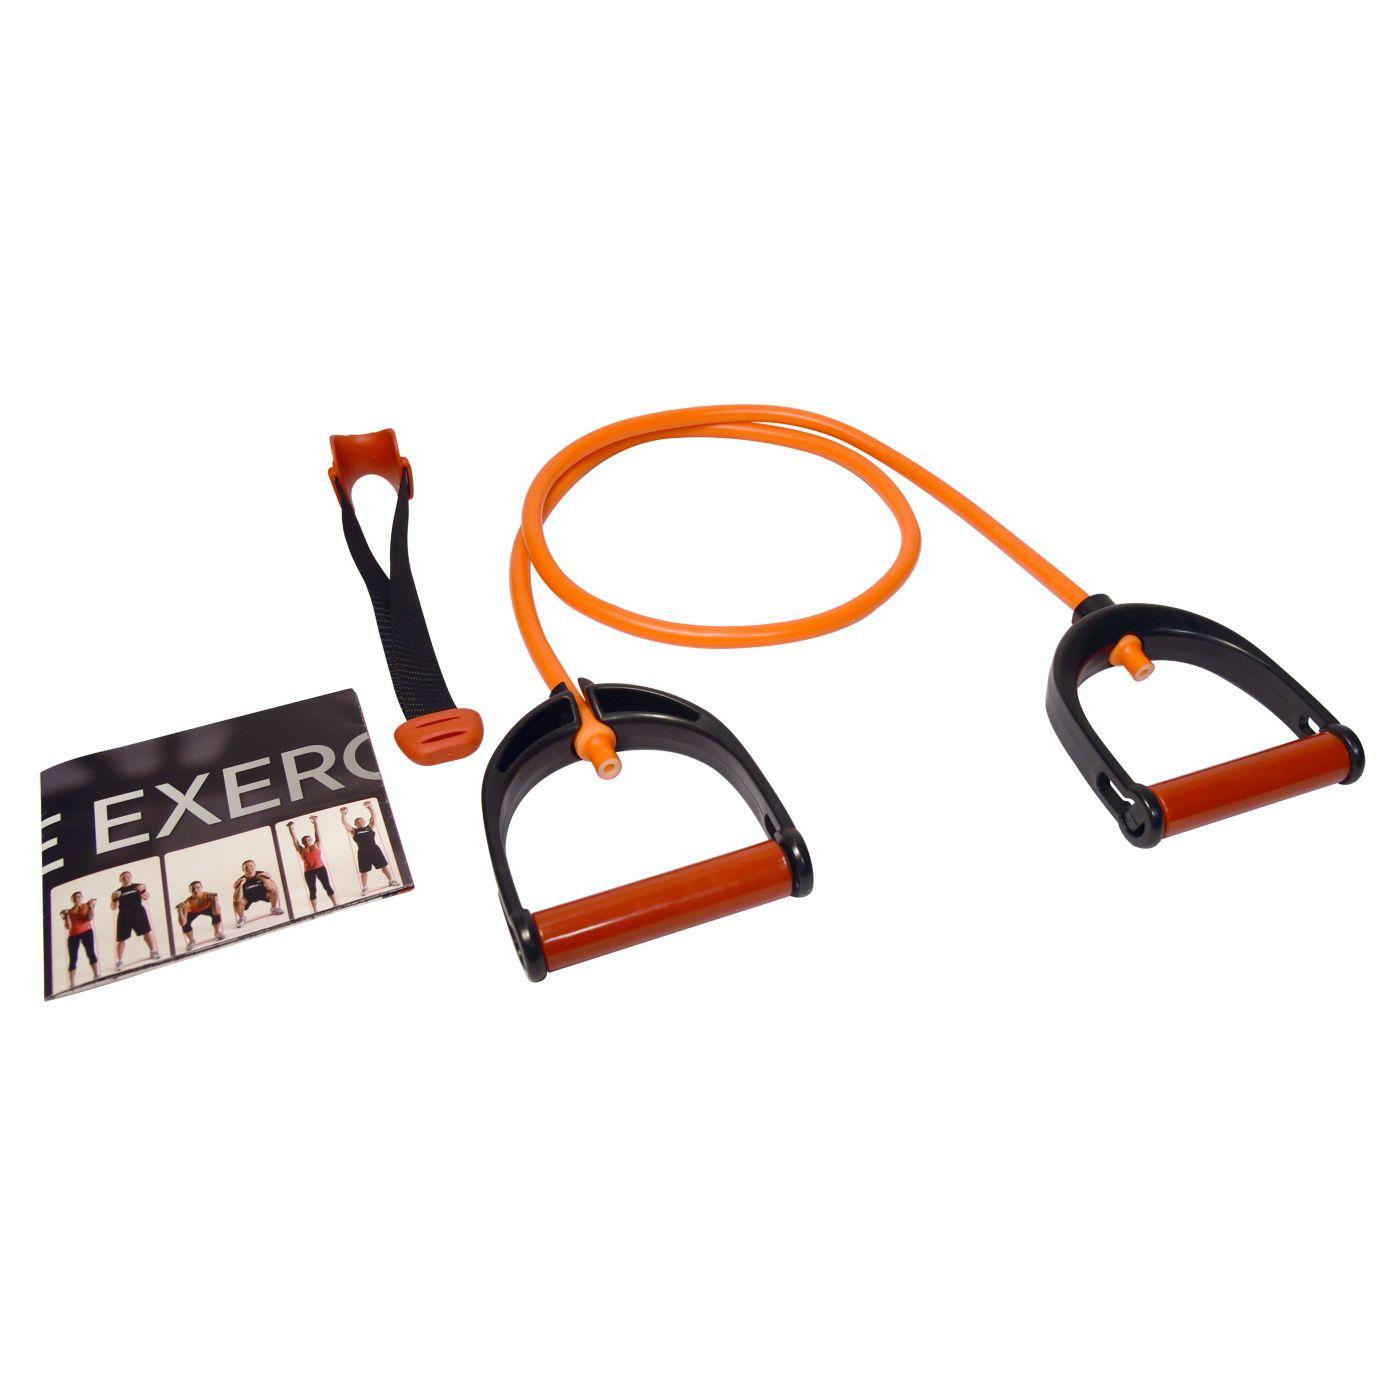 Lifeline Power Cable - 50LBS